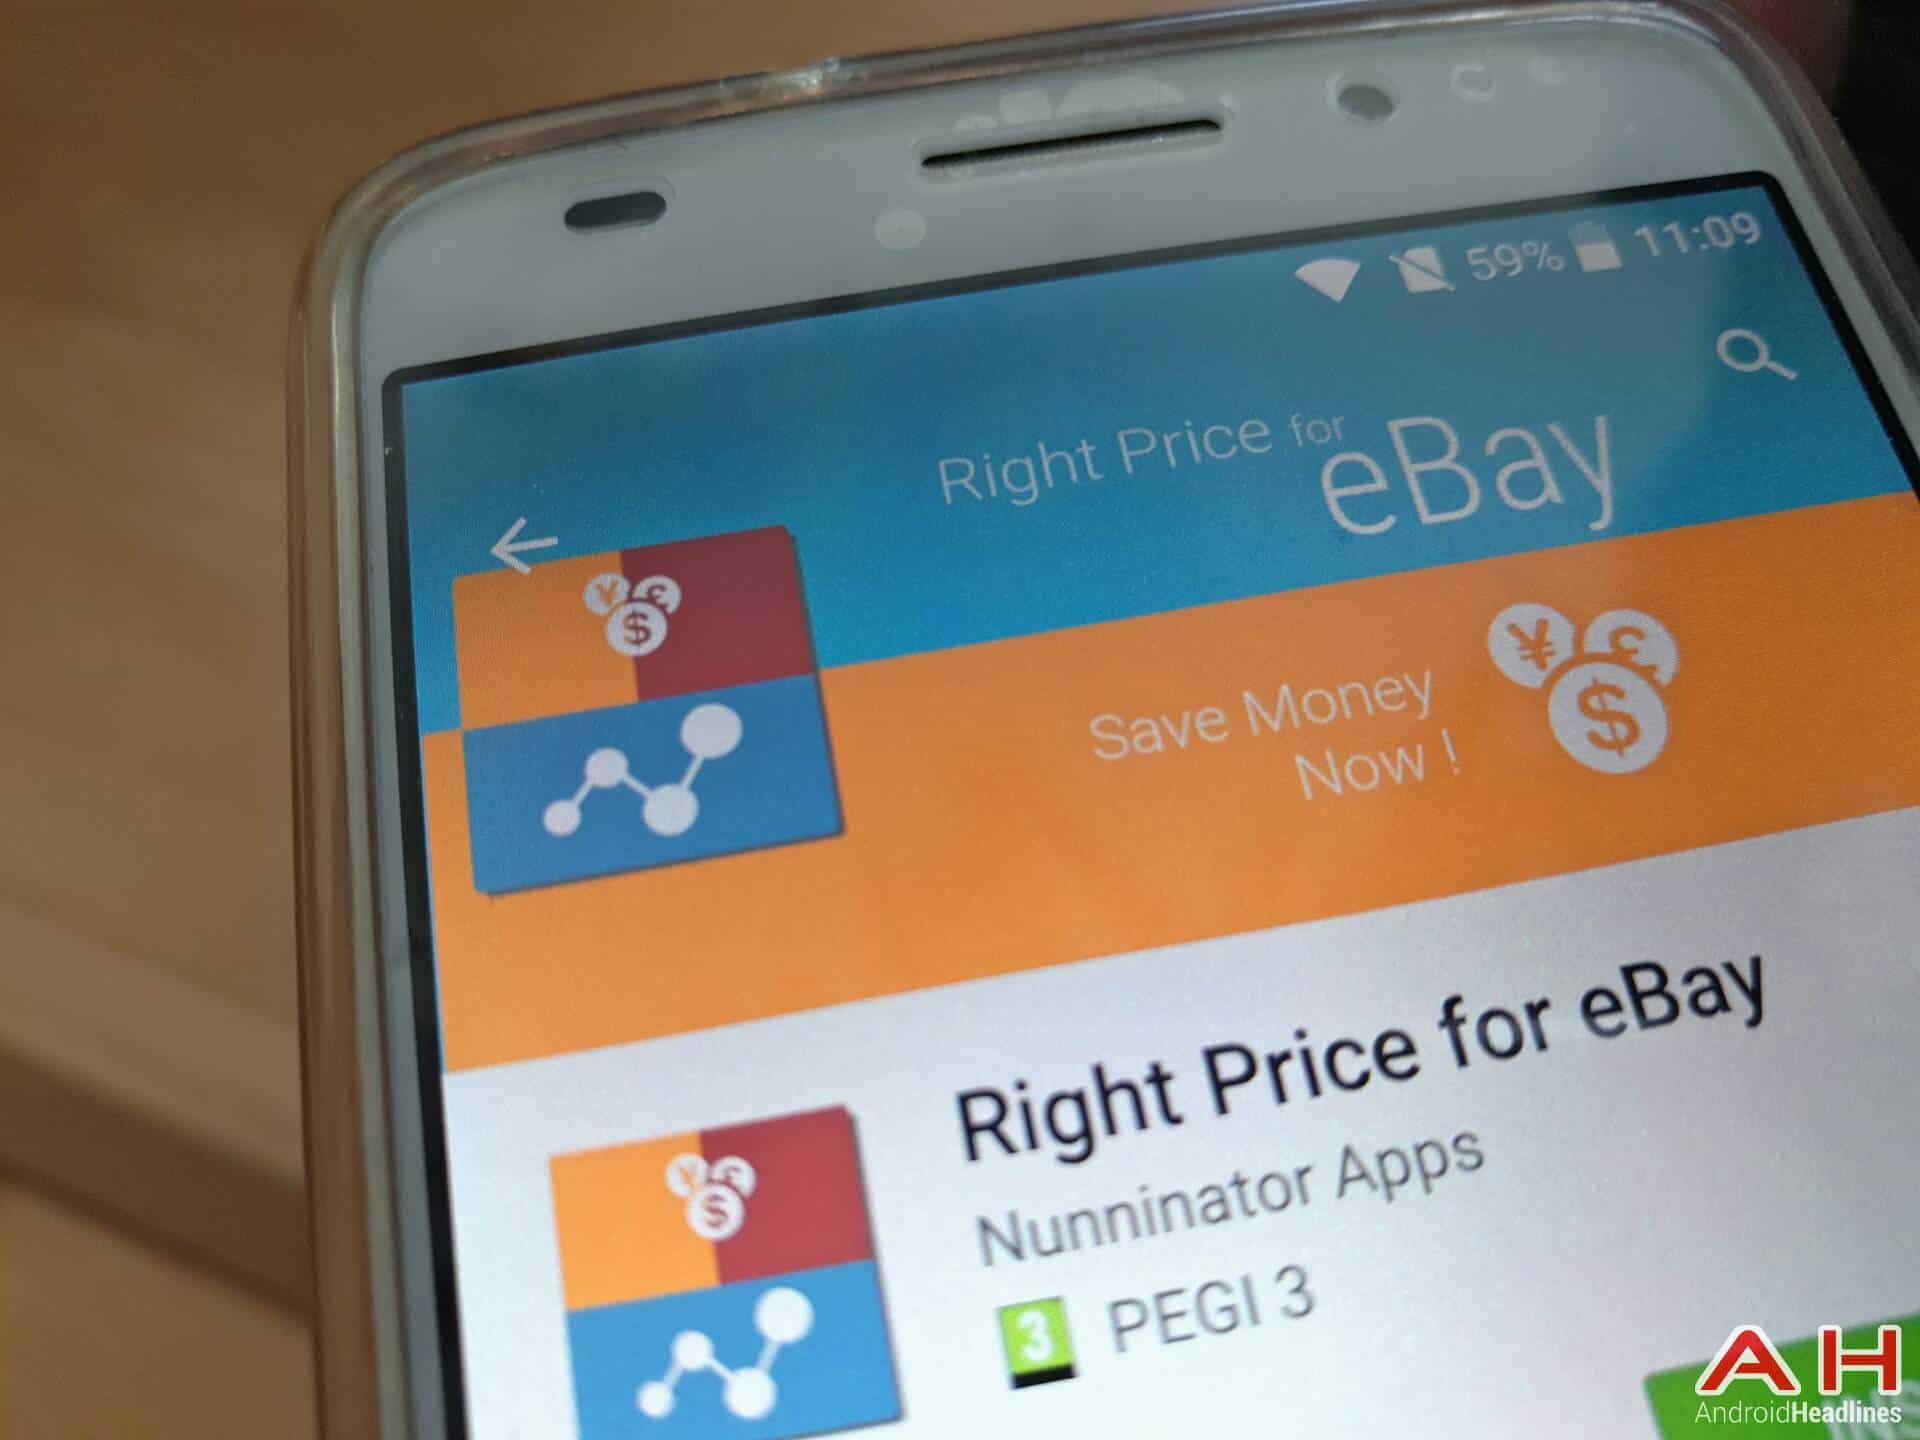 AH Right Price for eBay app 1